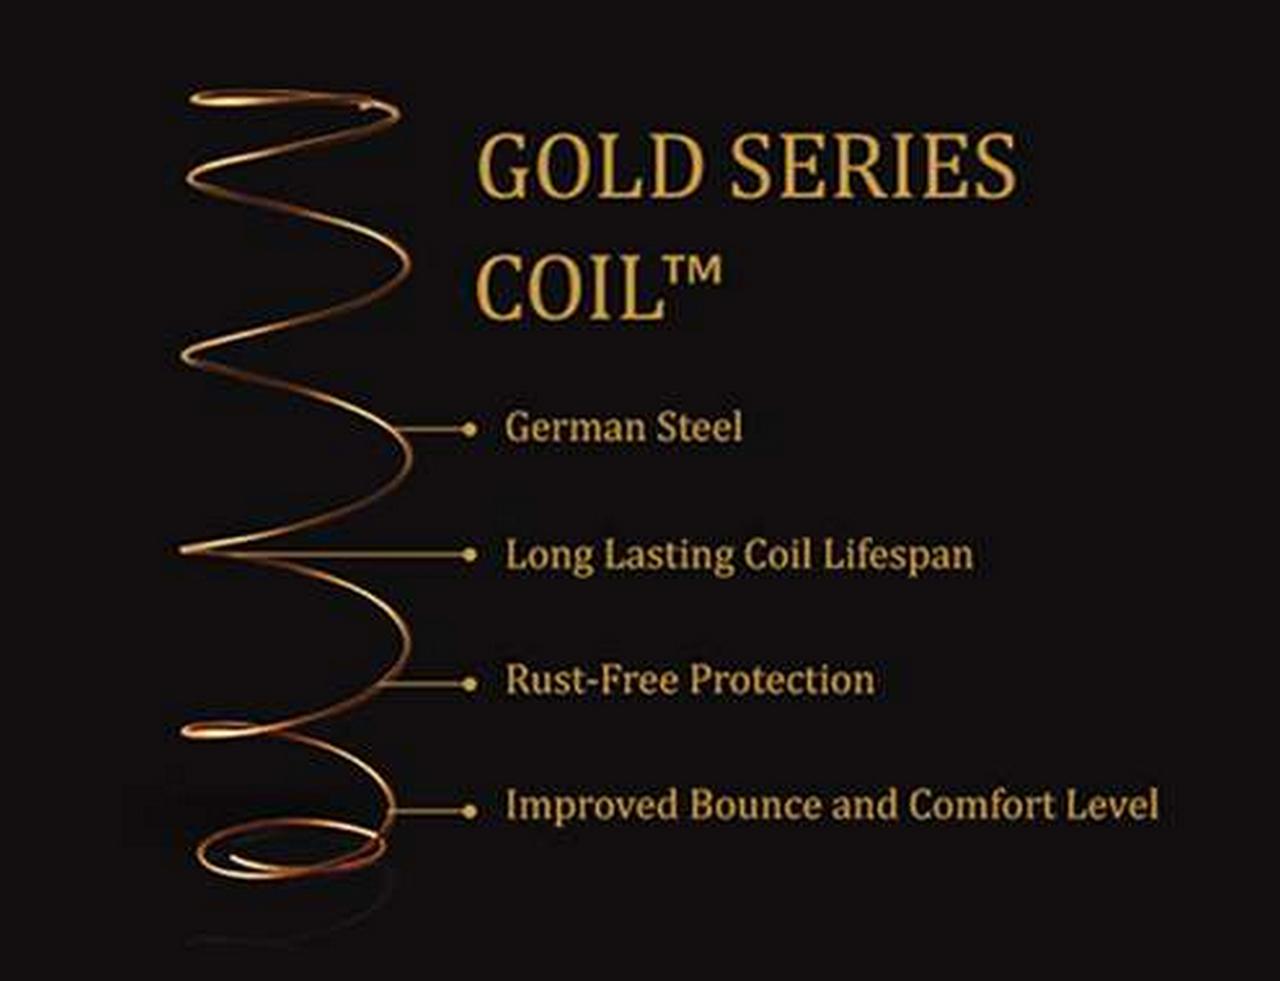 Gold-Coil-coil spring mattress-good quality mattress-memory foam spring mattress